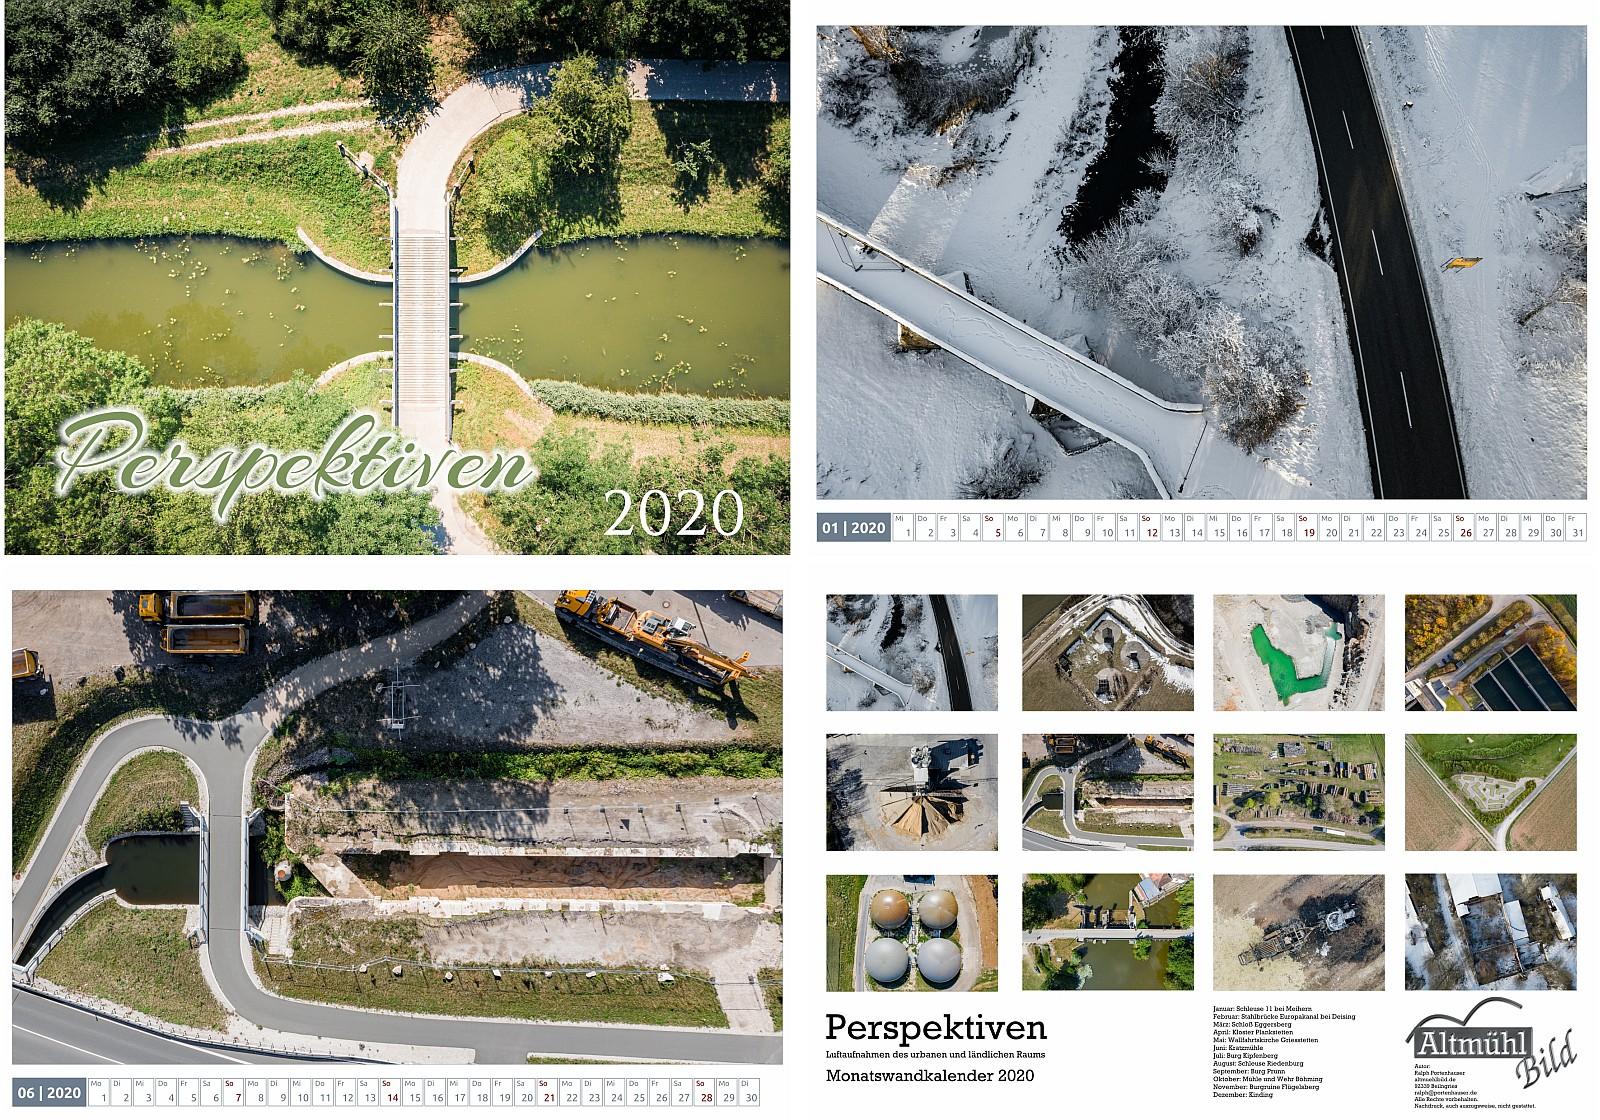 Indexbild Perspektiven 2020